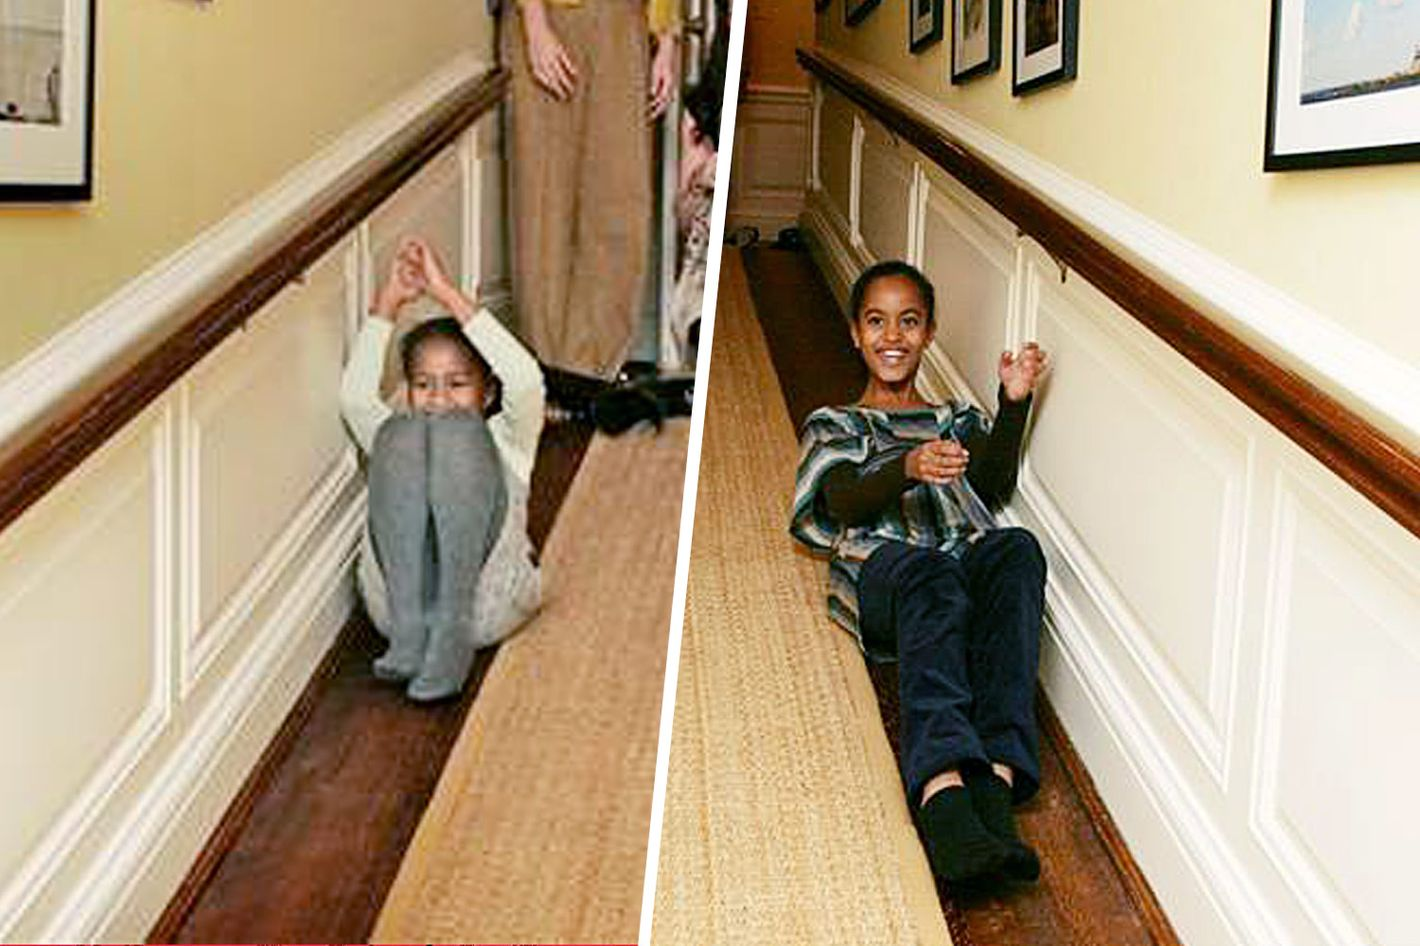 Adorable Photos Of Malia And Sasha S First White House Visit